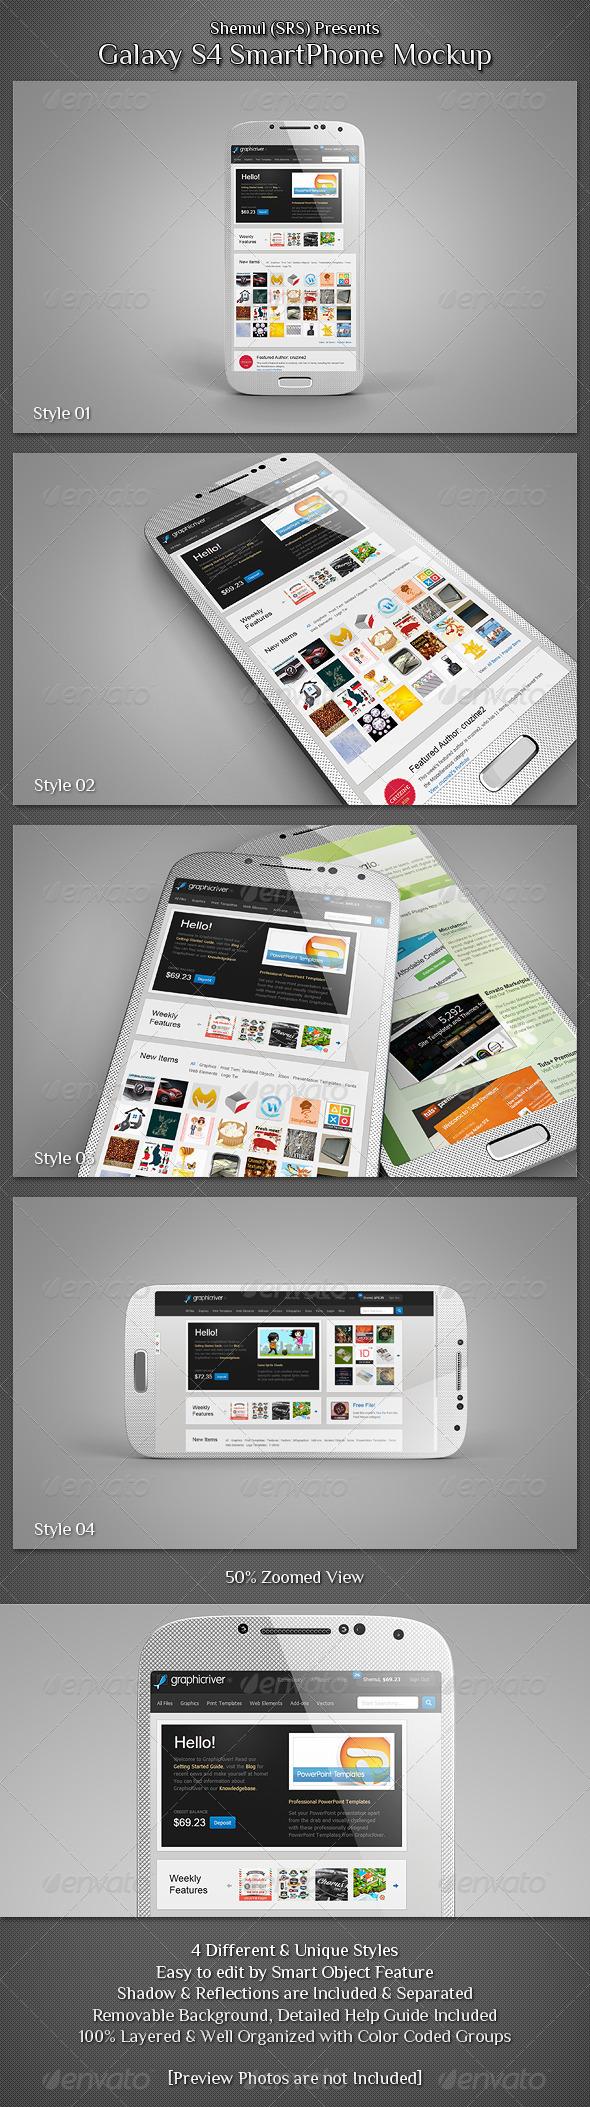 GraphicRiver Galaxy S4 Smartphone Mockup 4884103